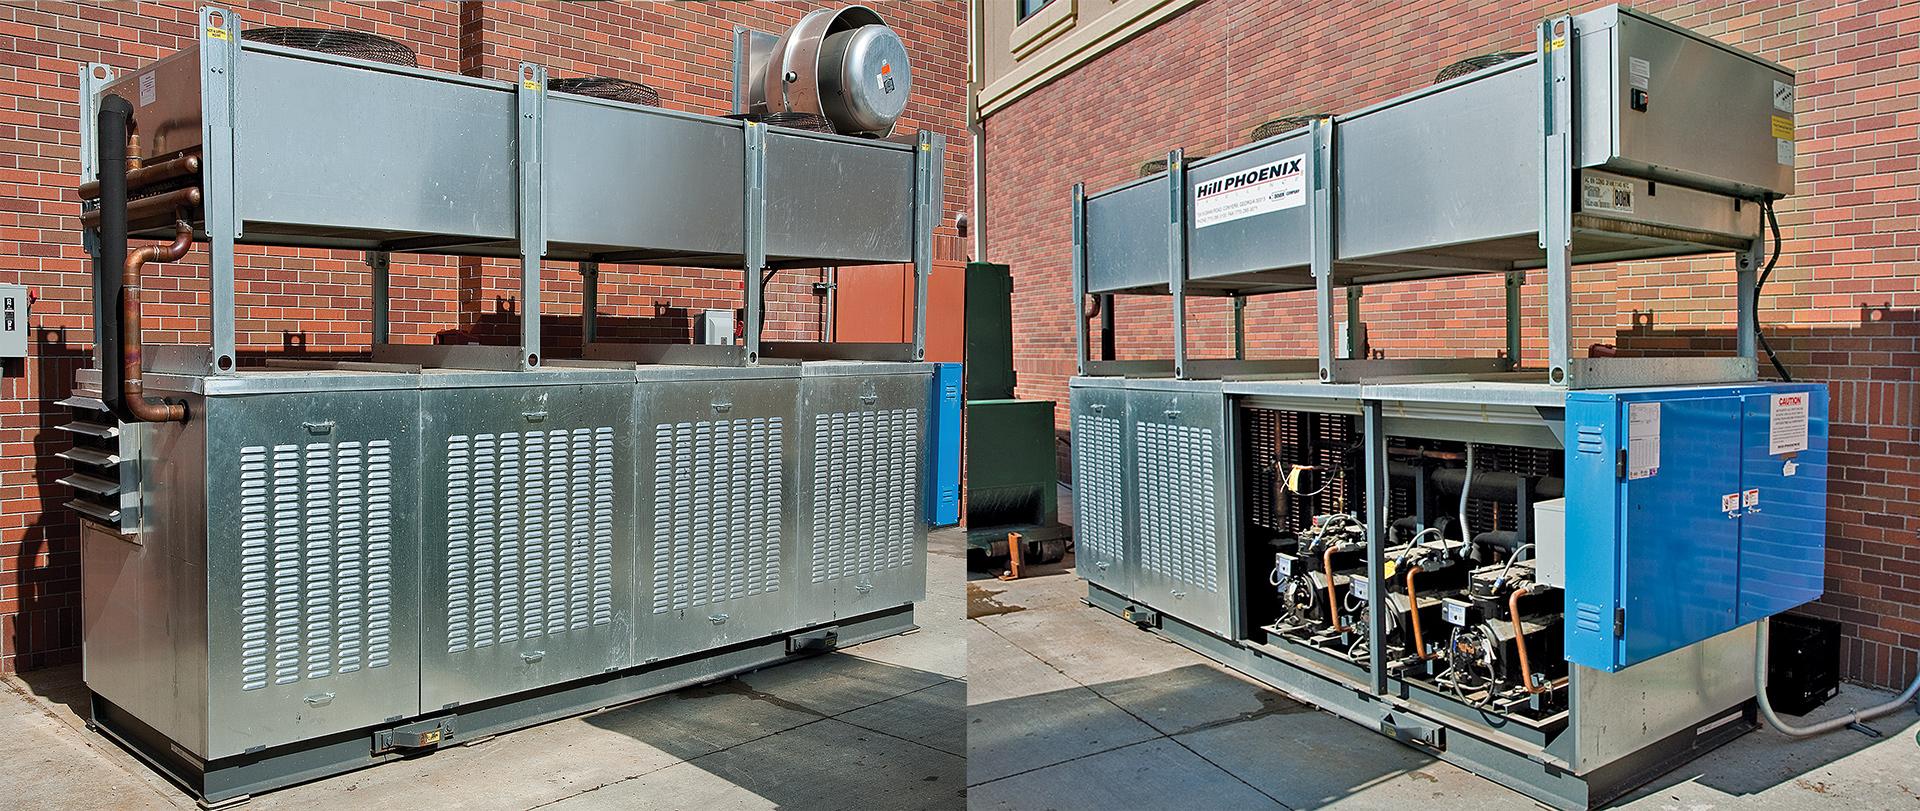 Paratemp-refrigeration-system-hero-image